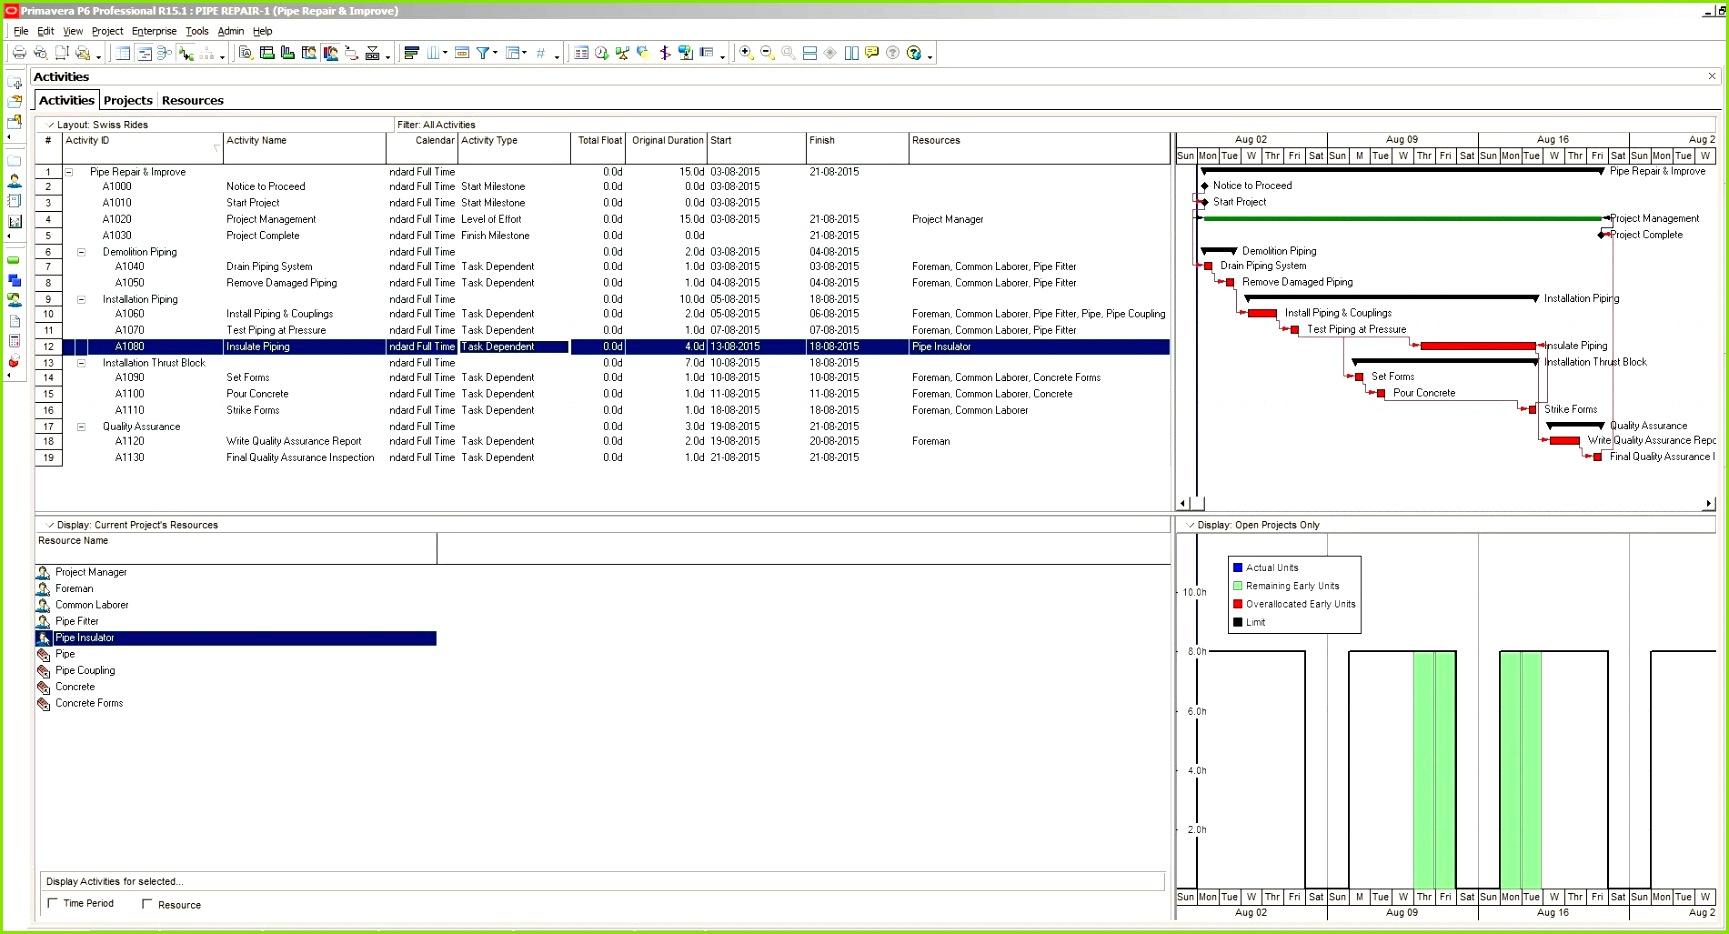 phonegap templates new invoice template google docs luxury google invoice template new of phonegap templates